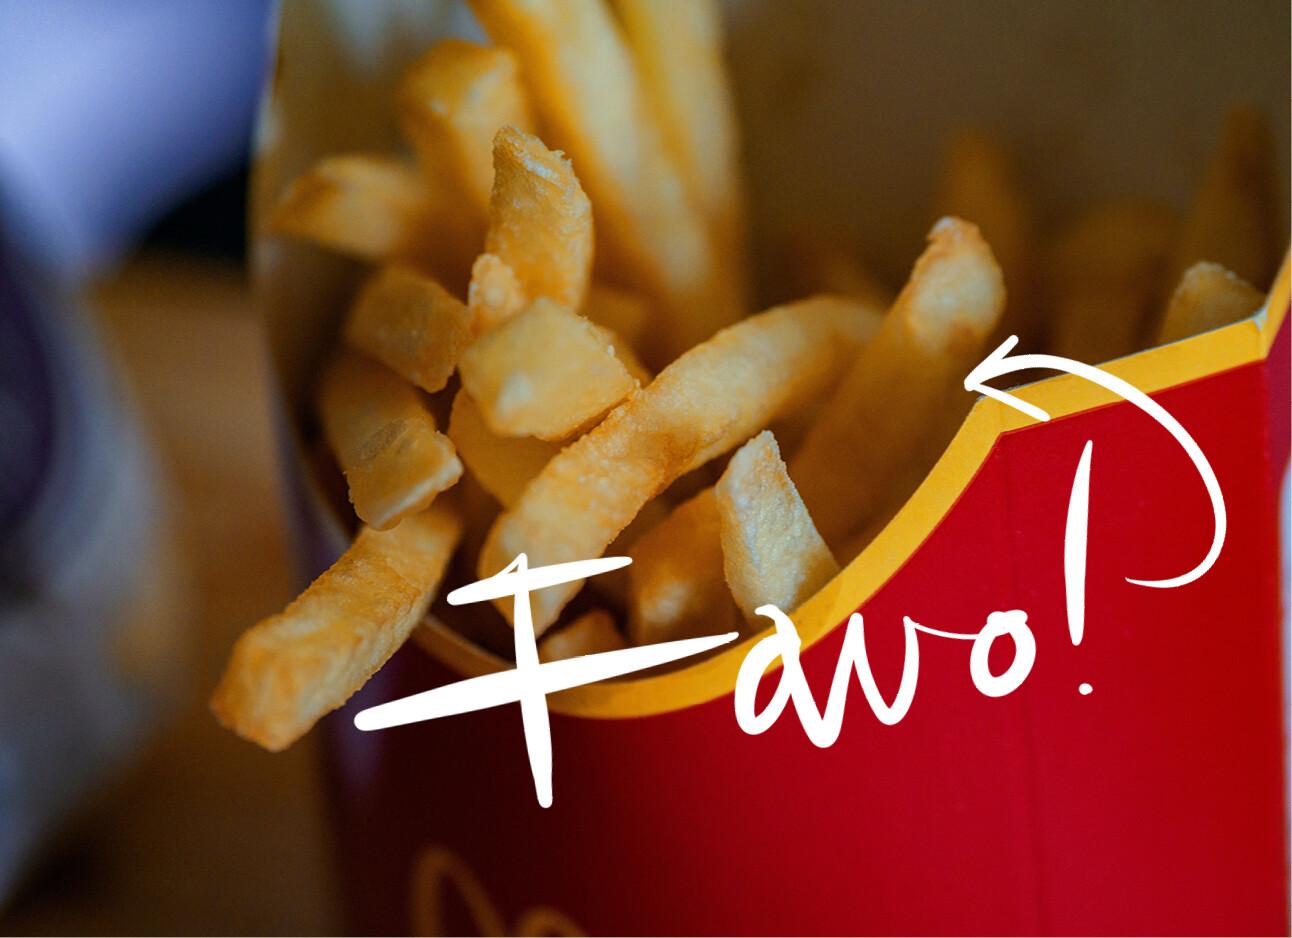 Whut? McDonald's maakt hun frietjes dus expres zo verslavend